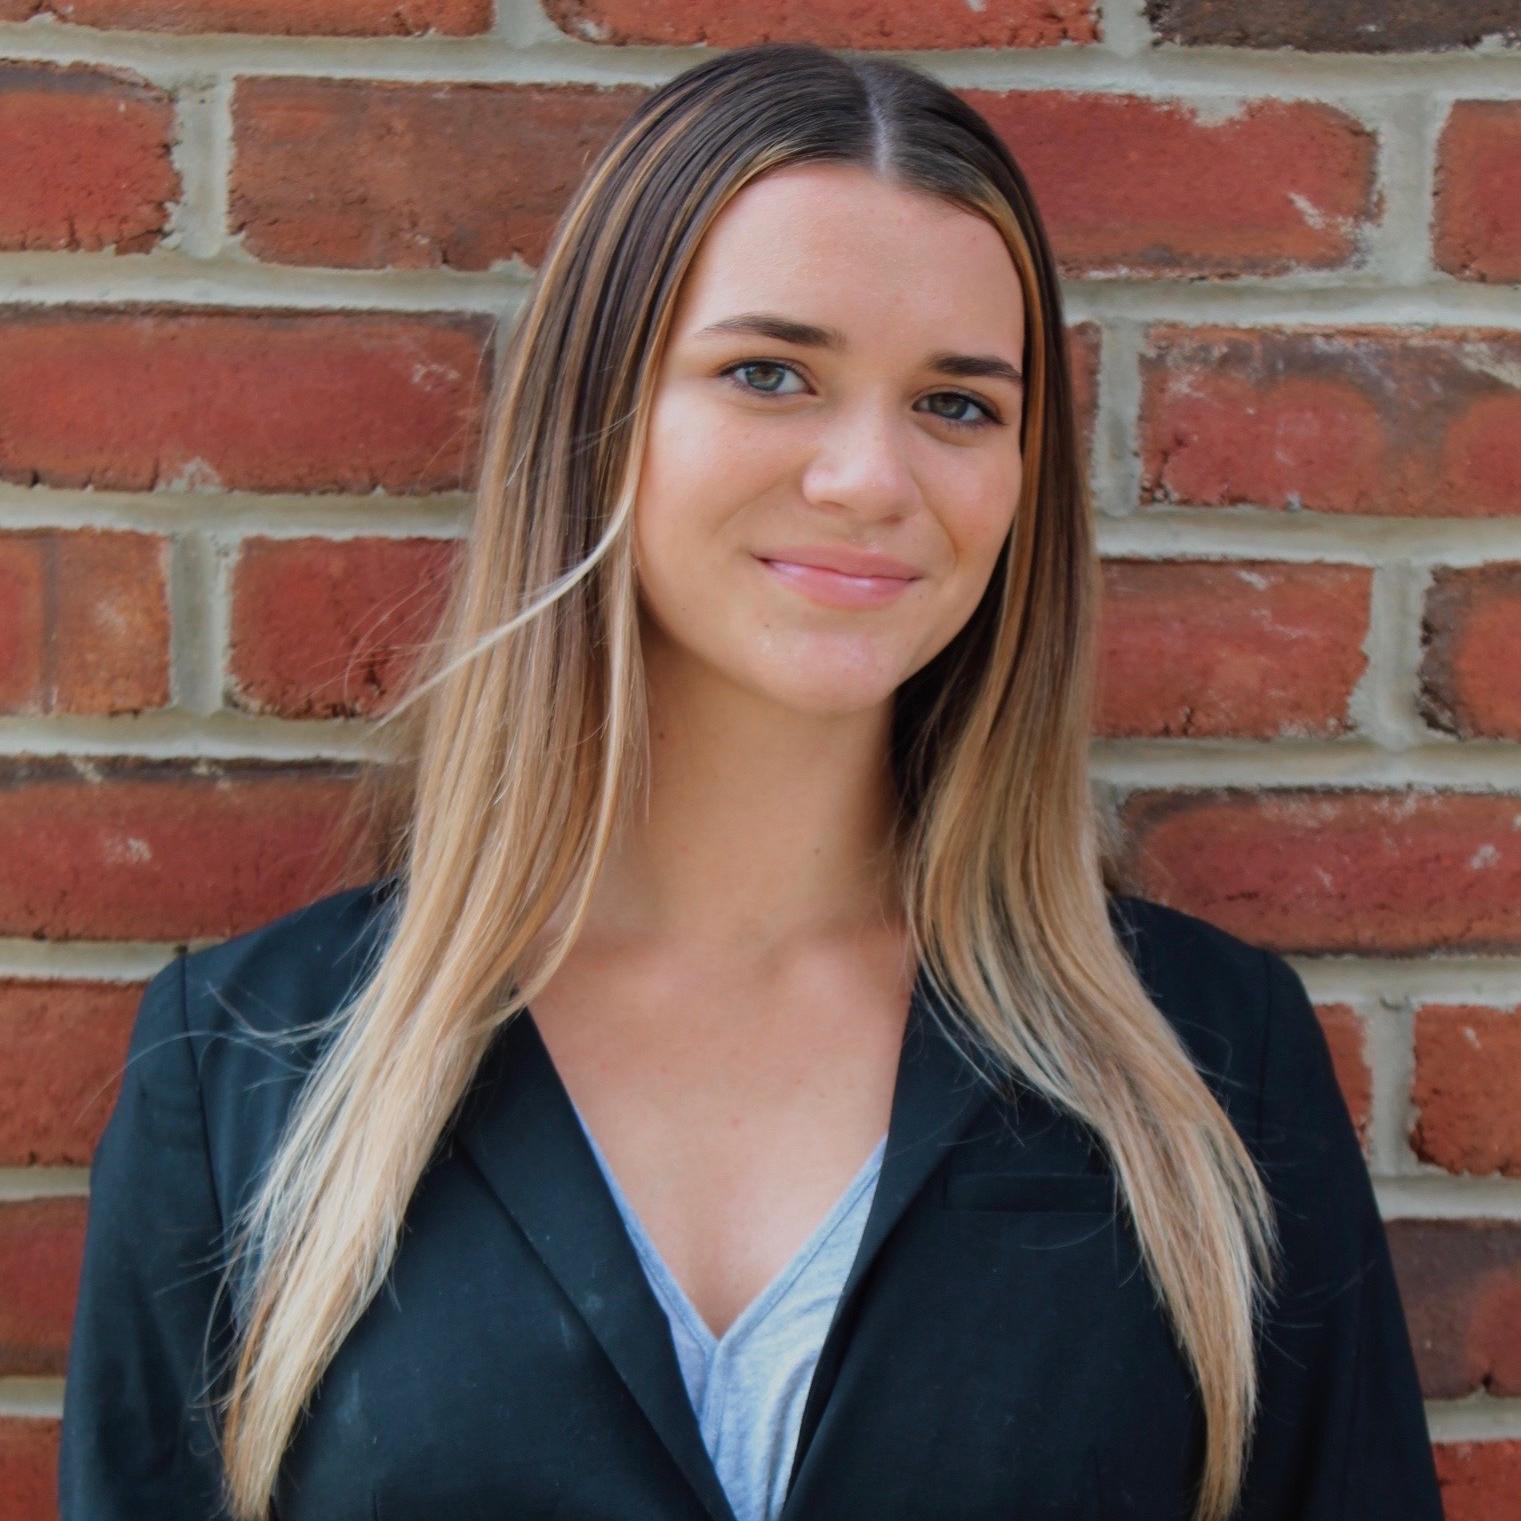 Jessica Reinhart from University of Florida